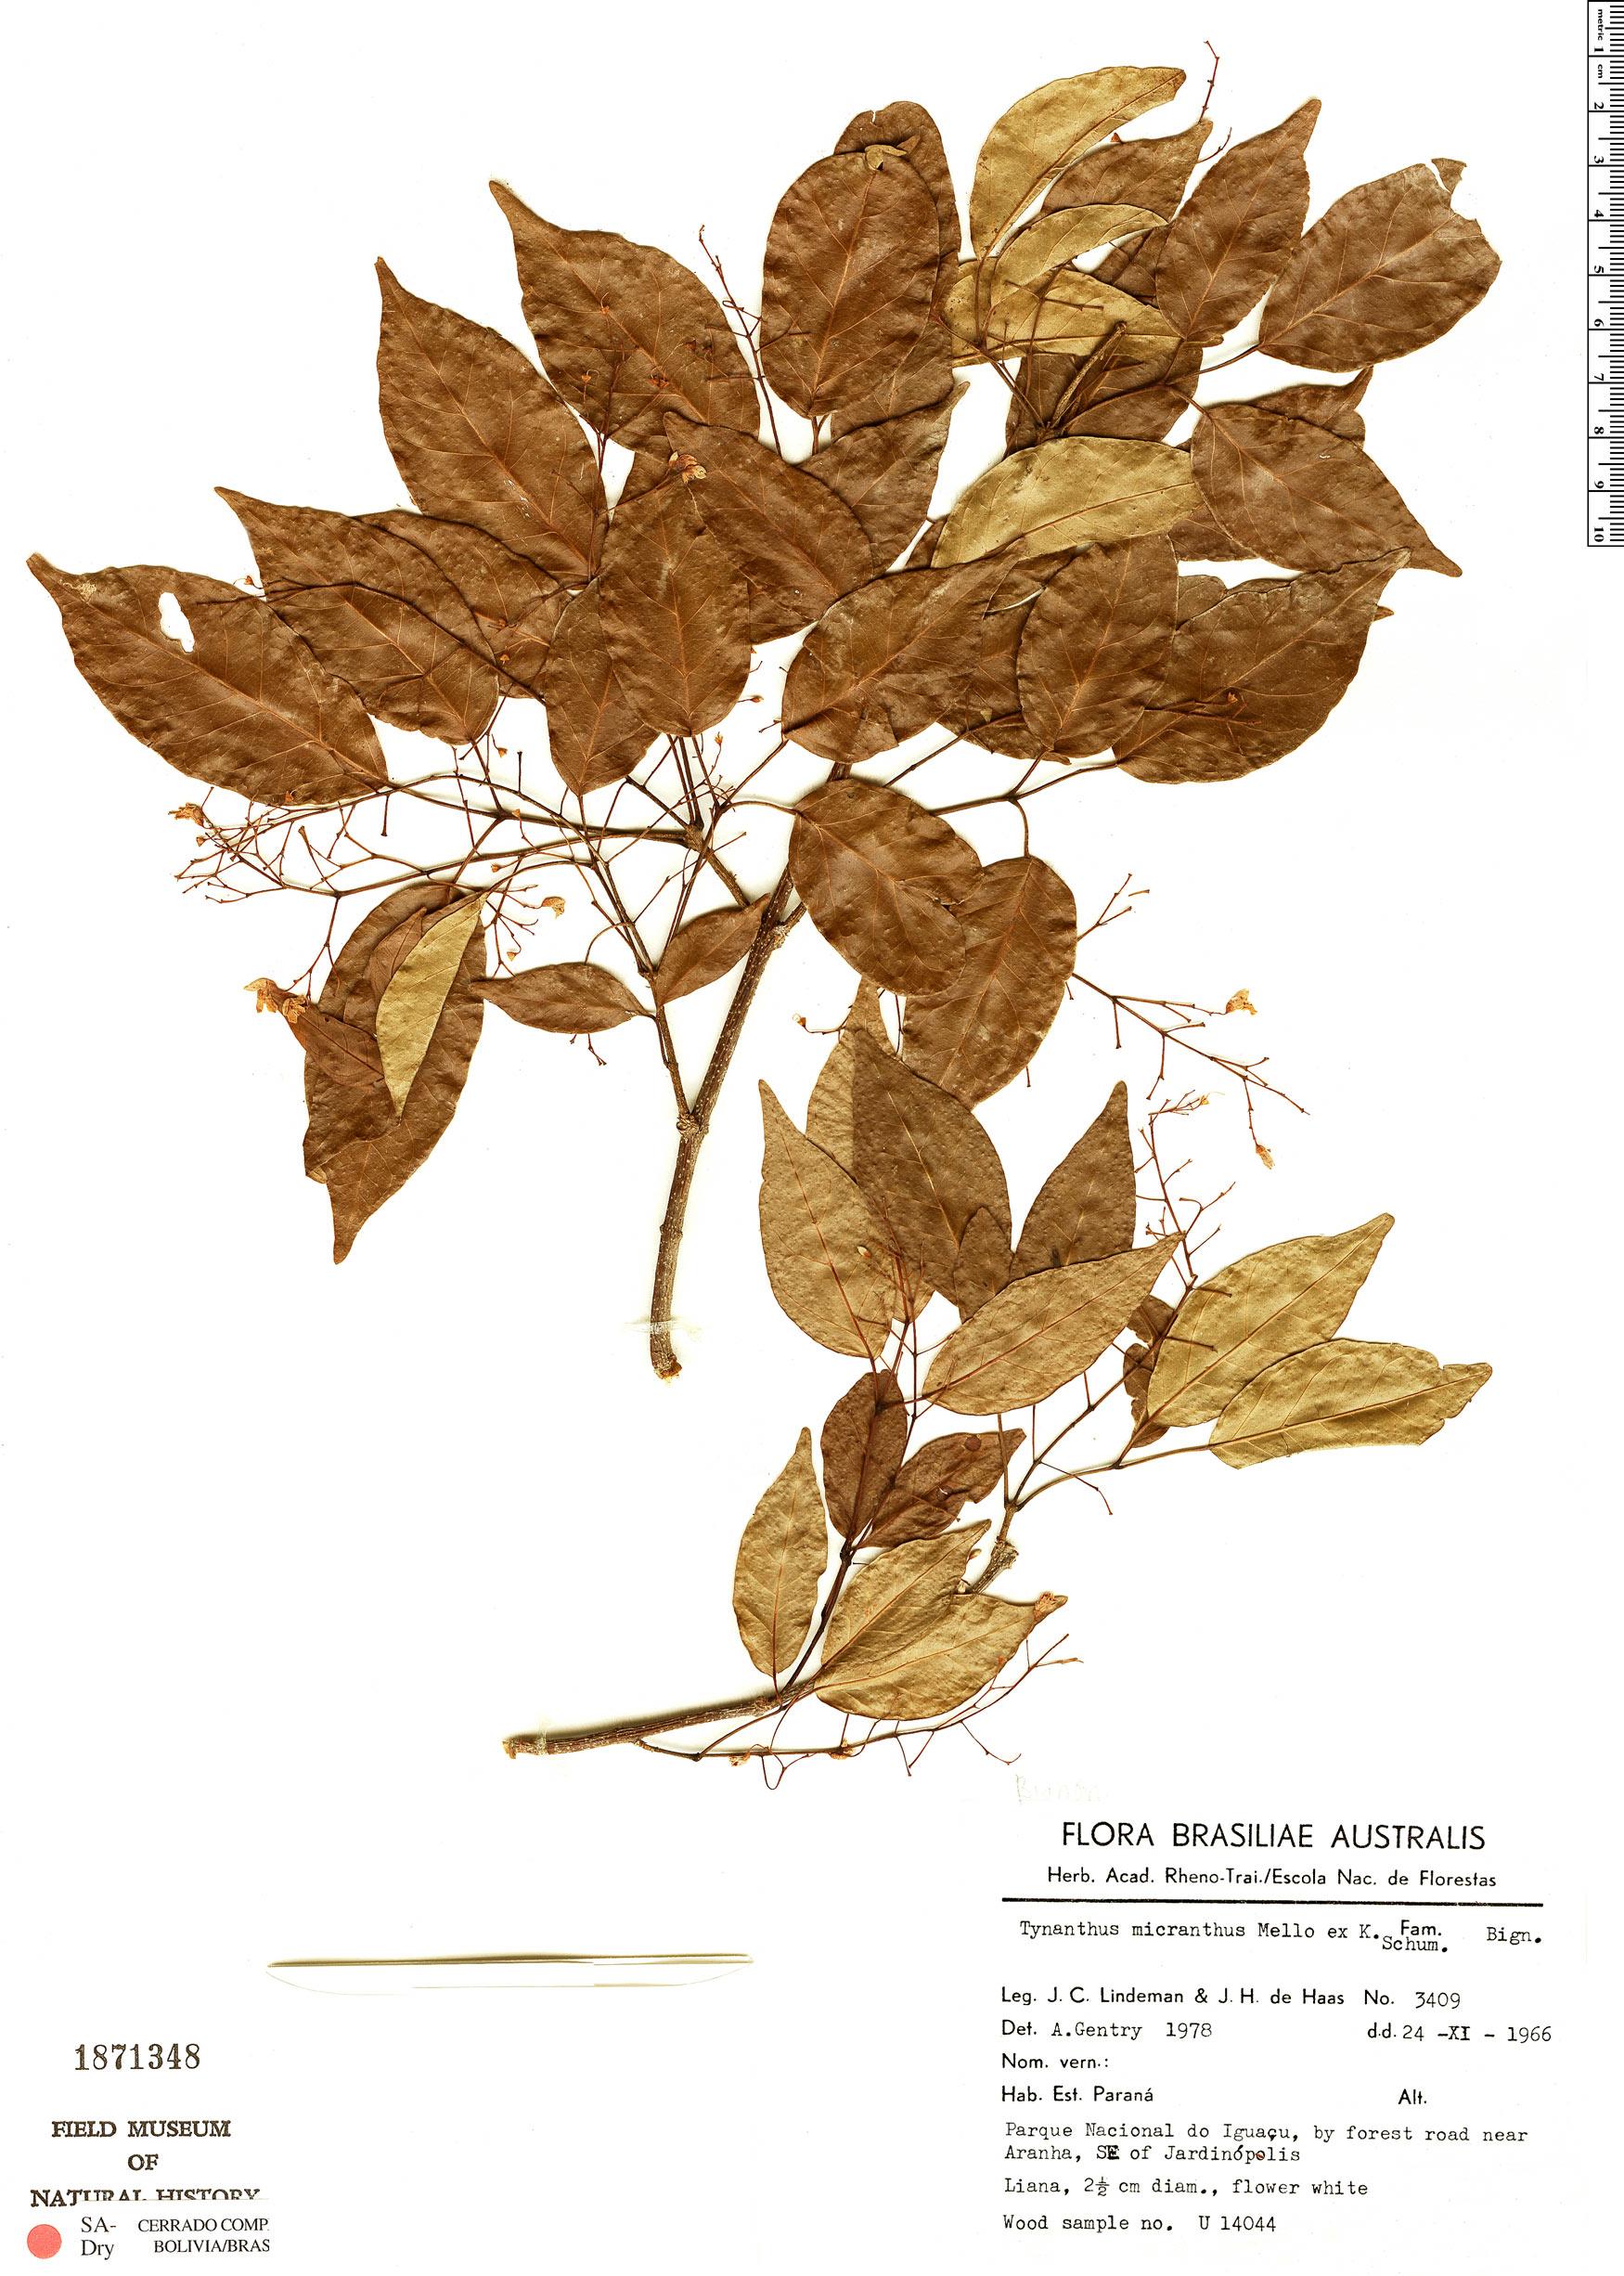 Specimen: Tynanthus micranthus